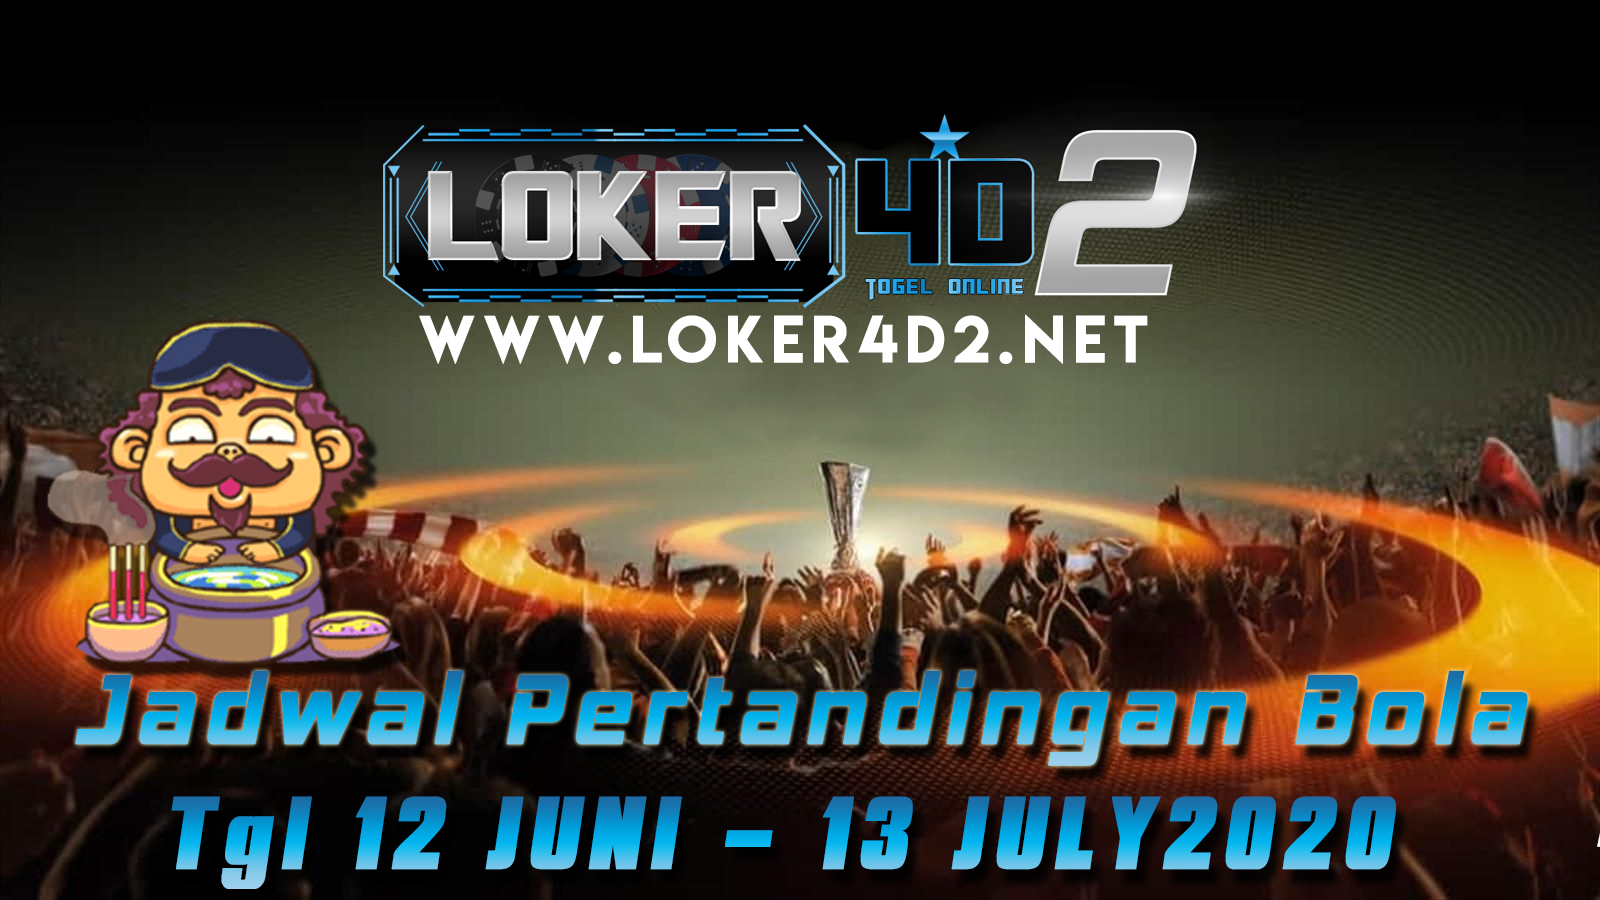 JADWAL PERTANDINGAN BOLA 12-13 JULI 2020